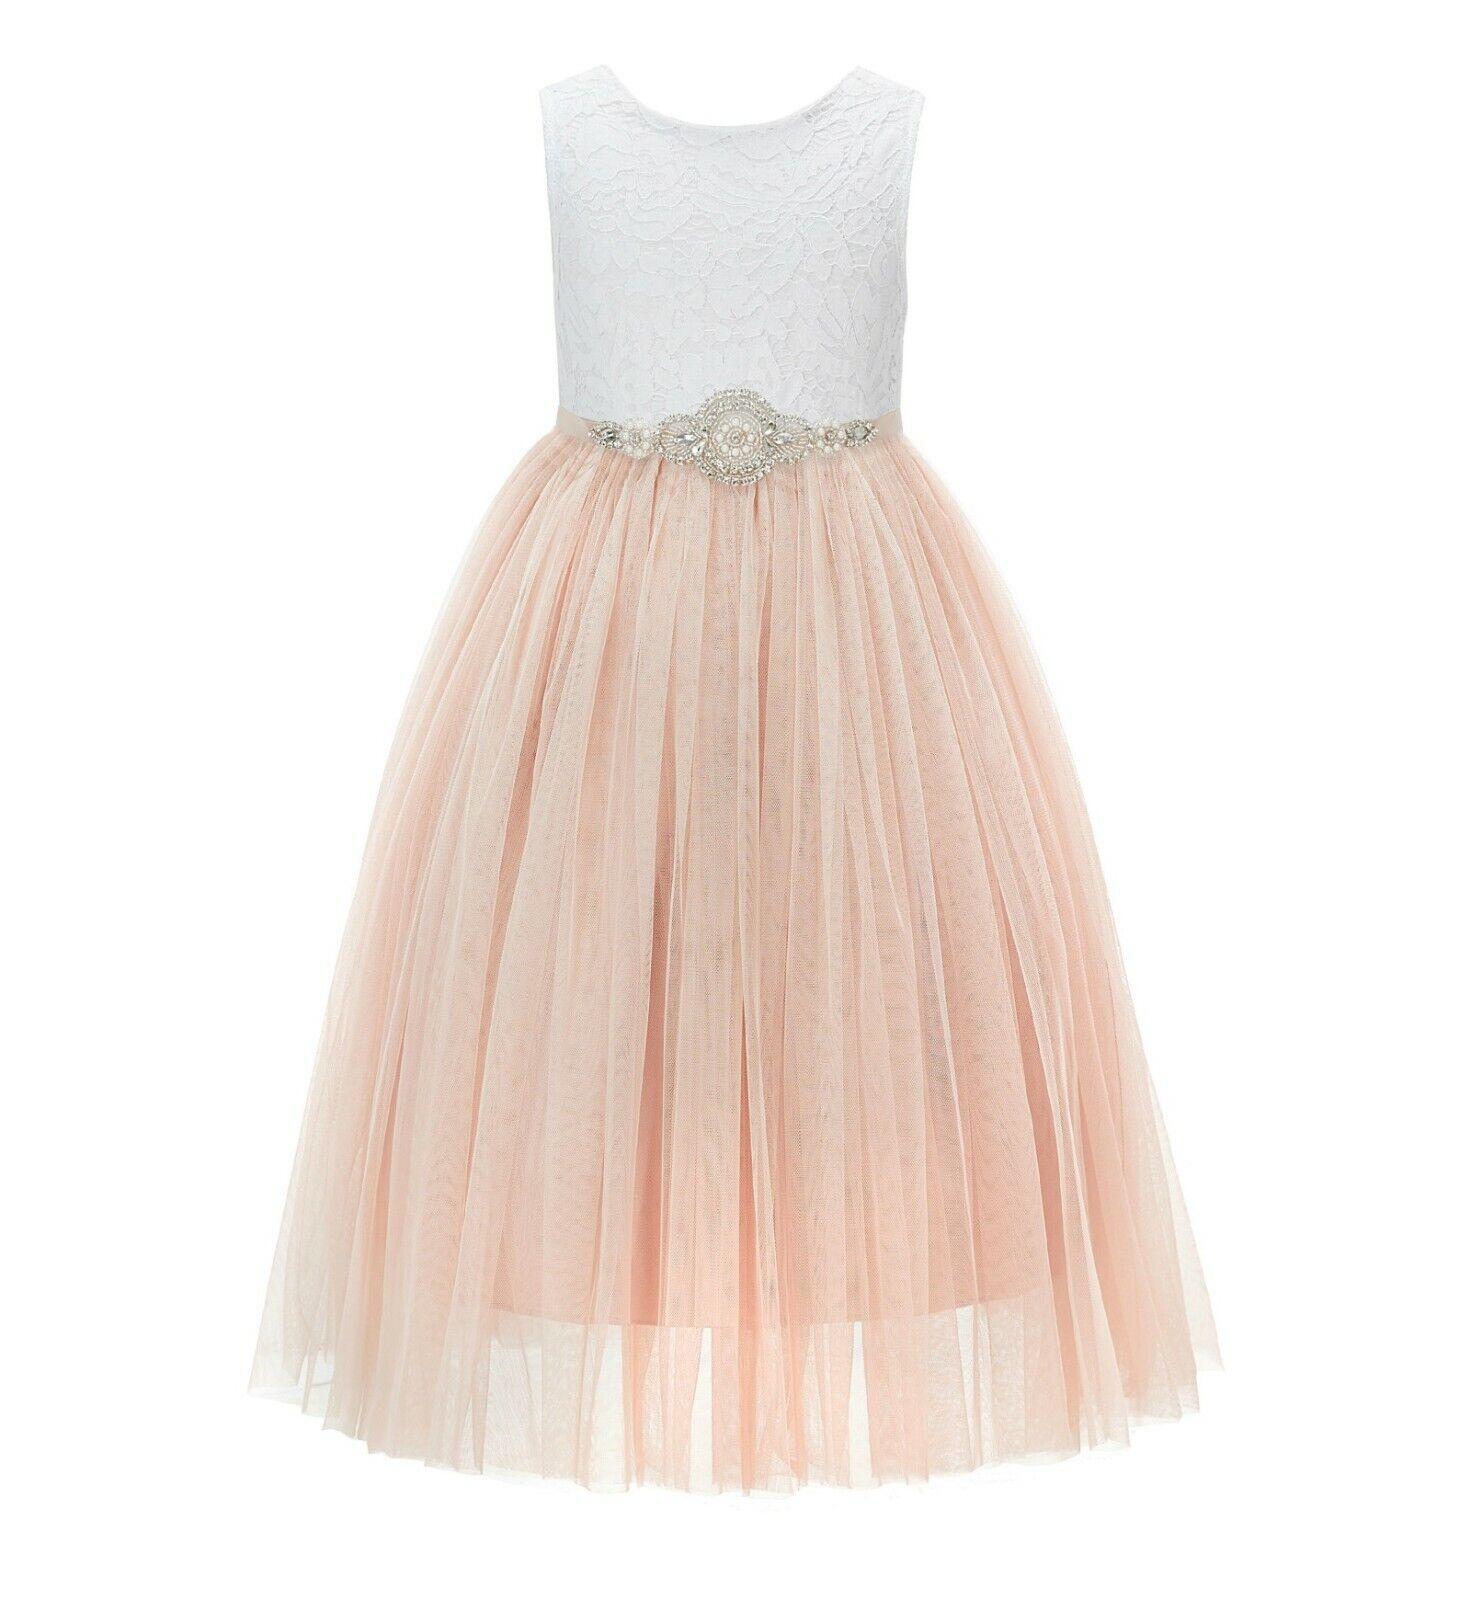 Scalloped V-Back Lace Flower Girl Dress Reception Dress Junior Bridesmaid Dress